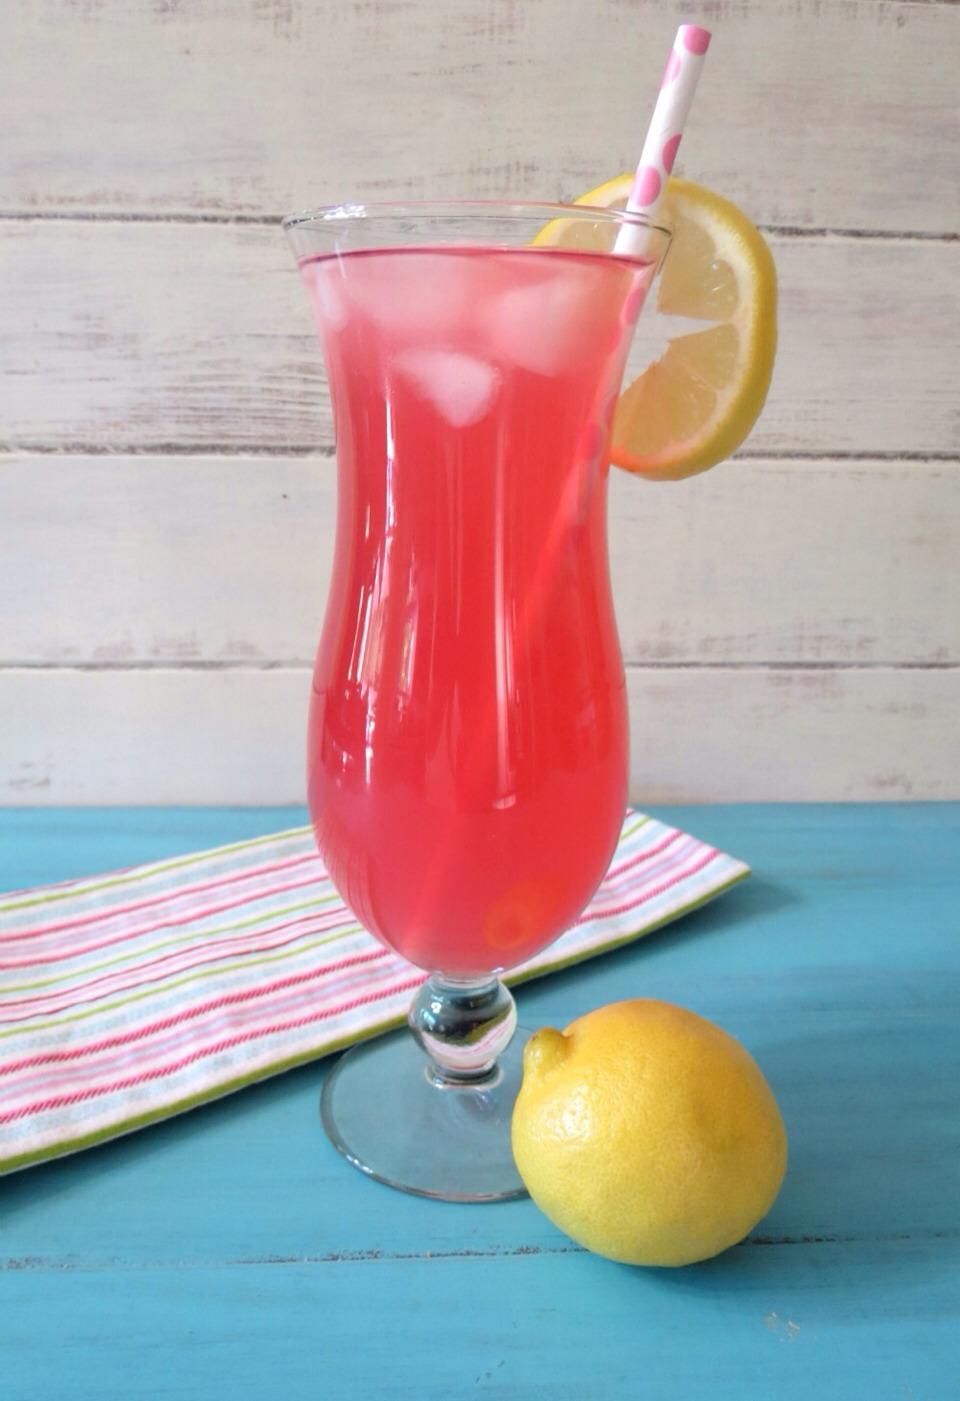 300g caster sugar, 1 1/2 lemons, 3 raspberries, 350ml water and ice